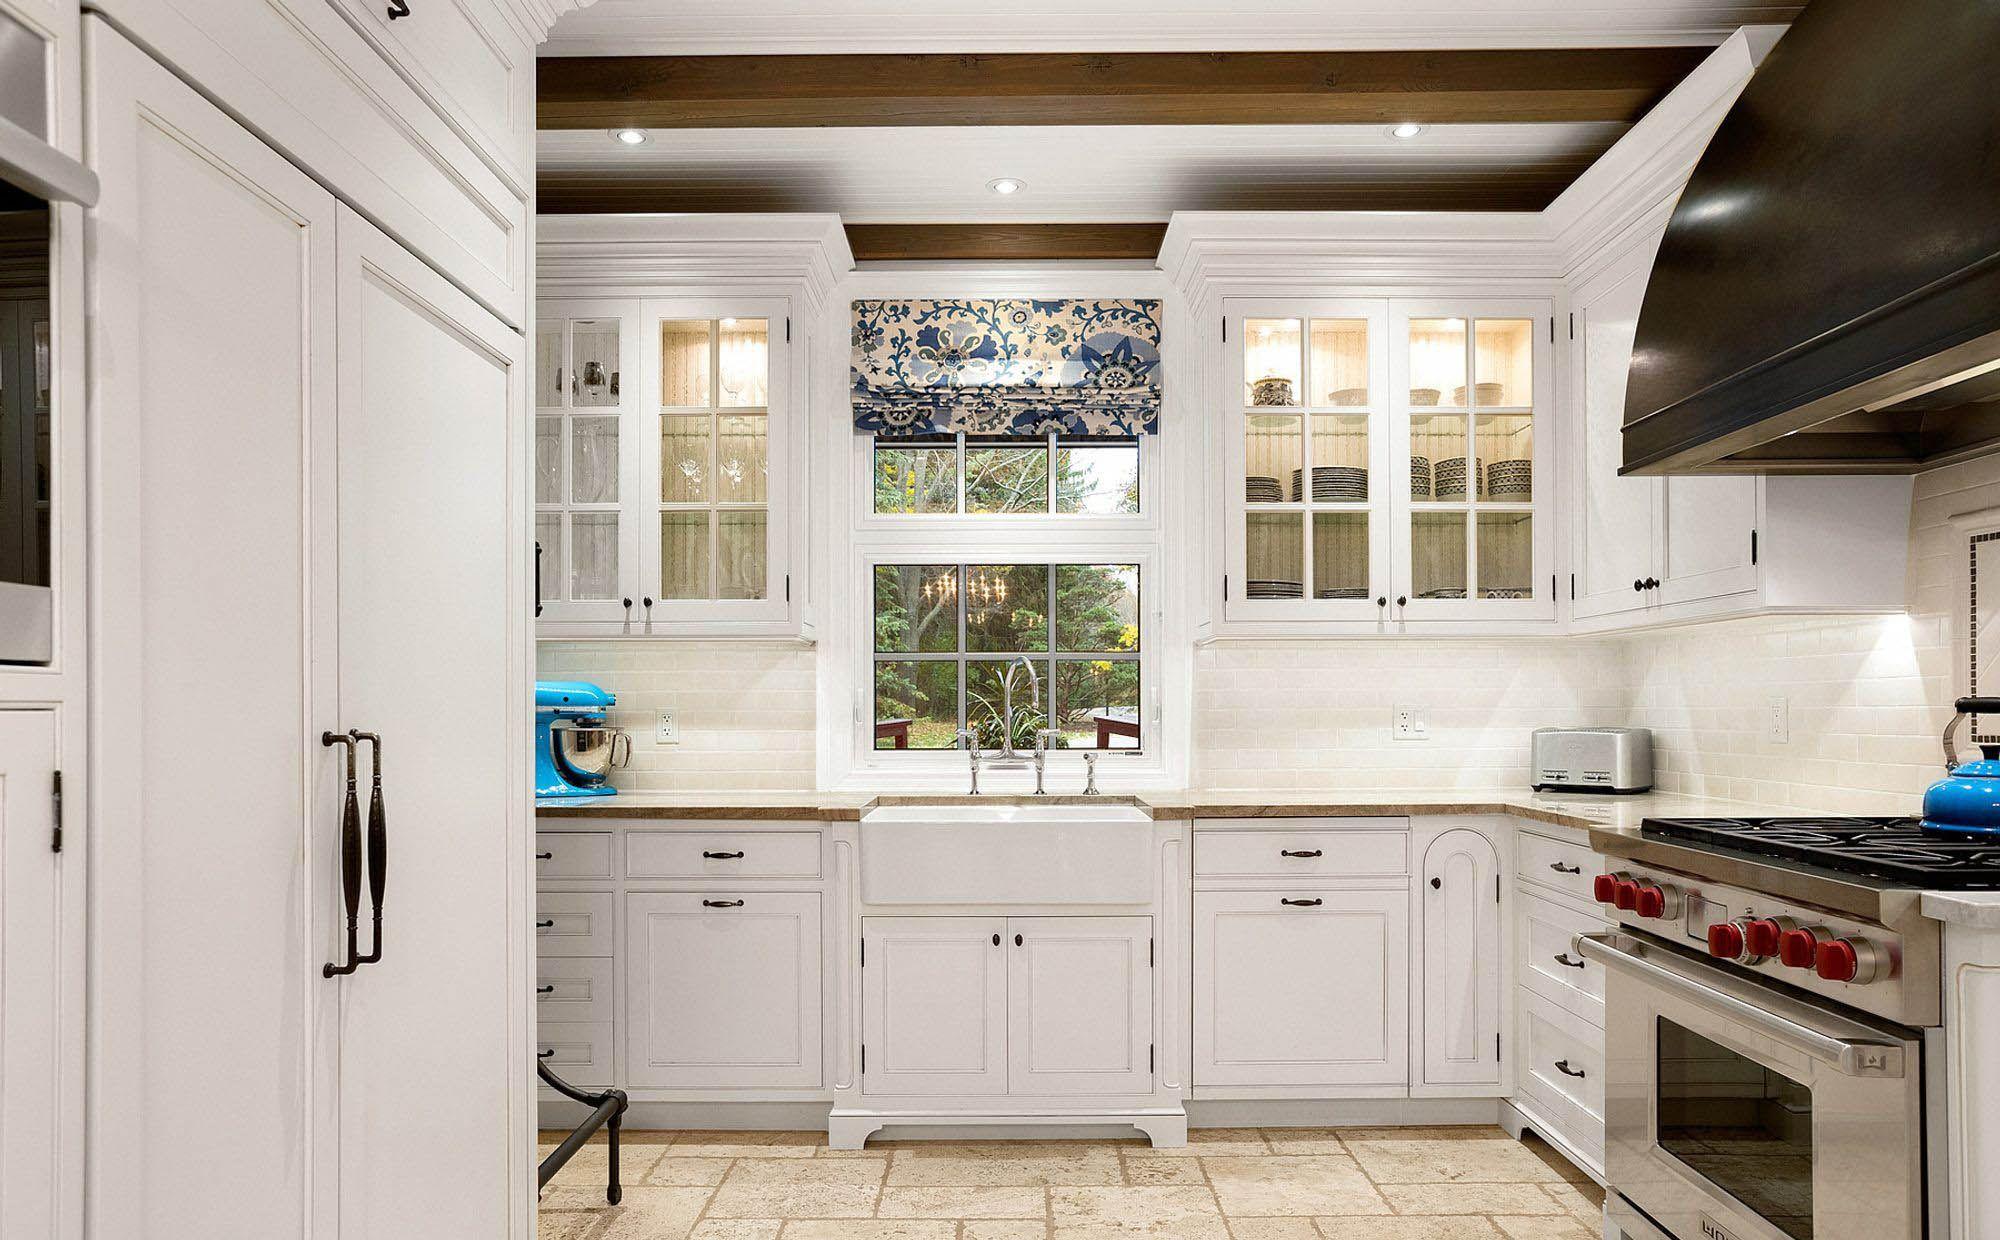 Farmhouse Kitchen Sink Ideas Designs Pictures Paint Kitchen Cabinets Like A Pro Kitchen Cabinets Painting Kitchen Cabinets